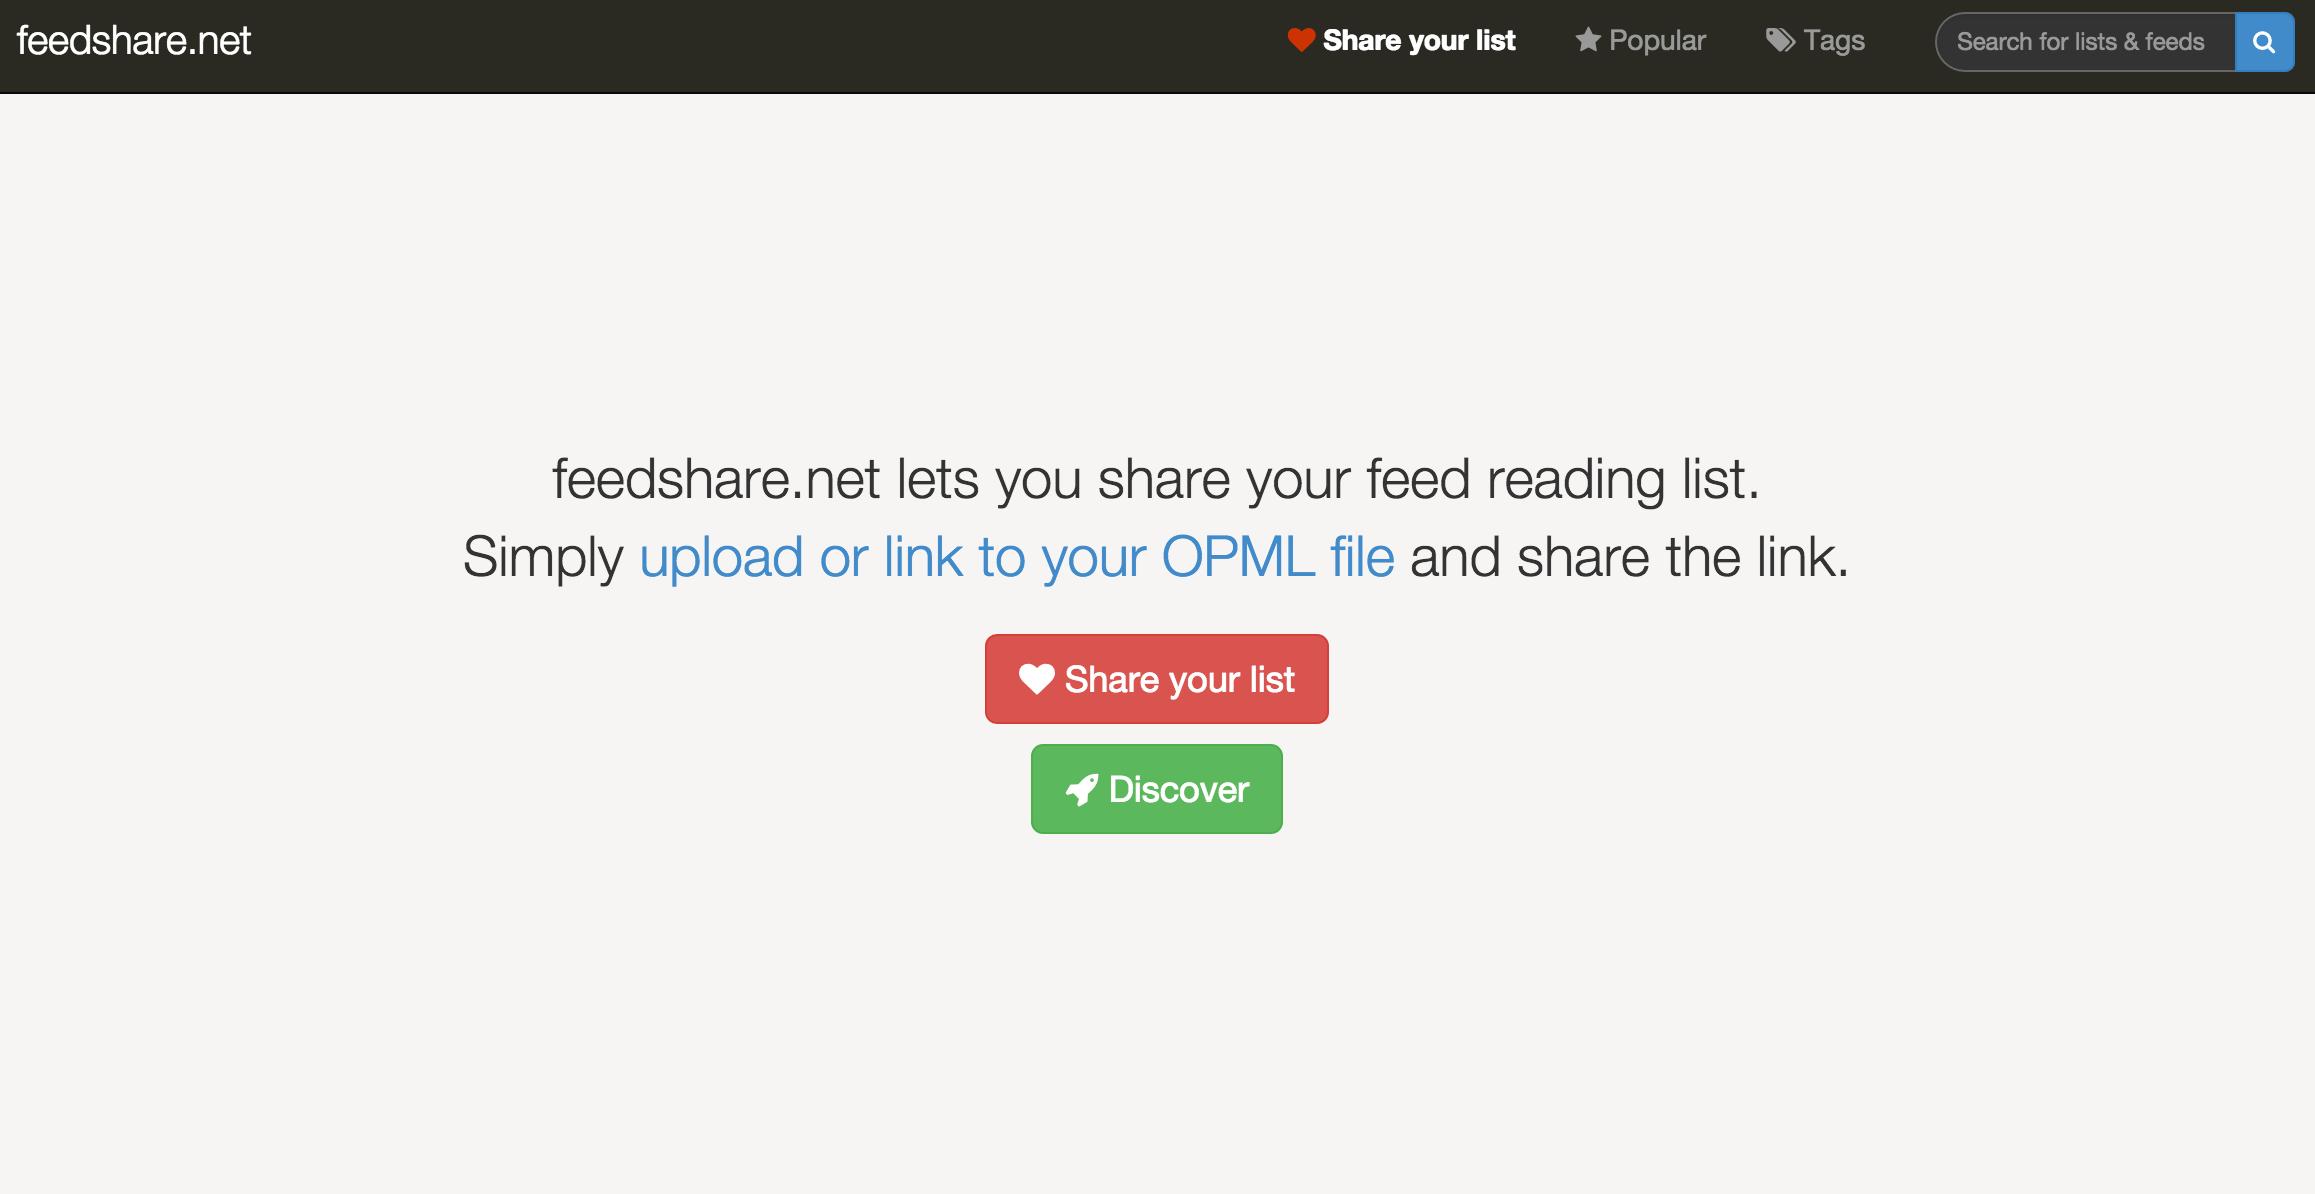 feedshare.net